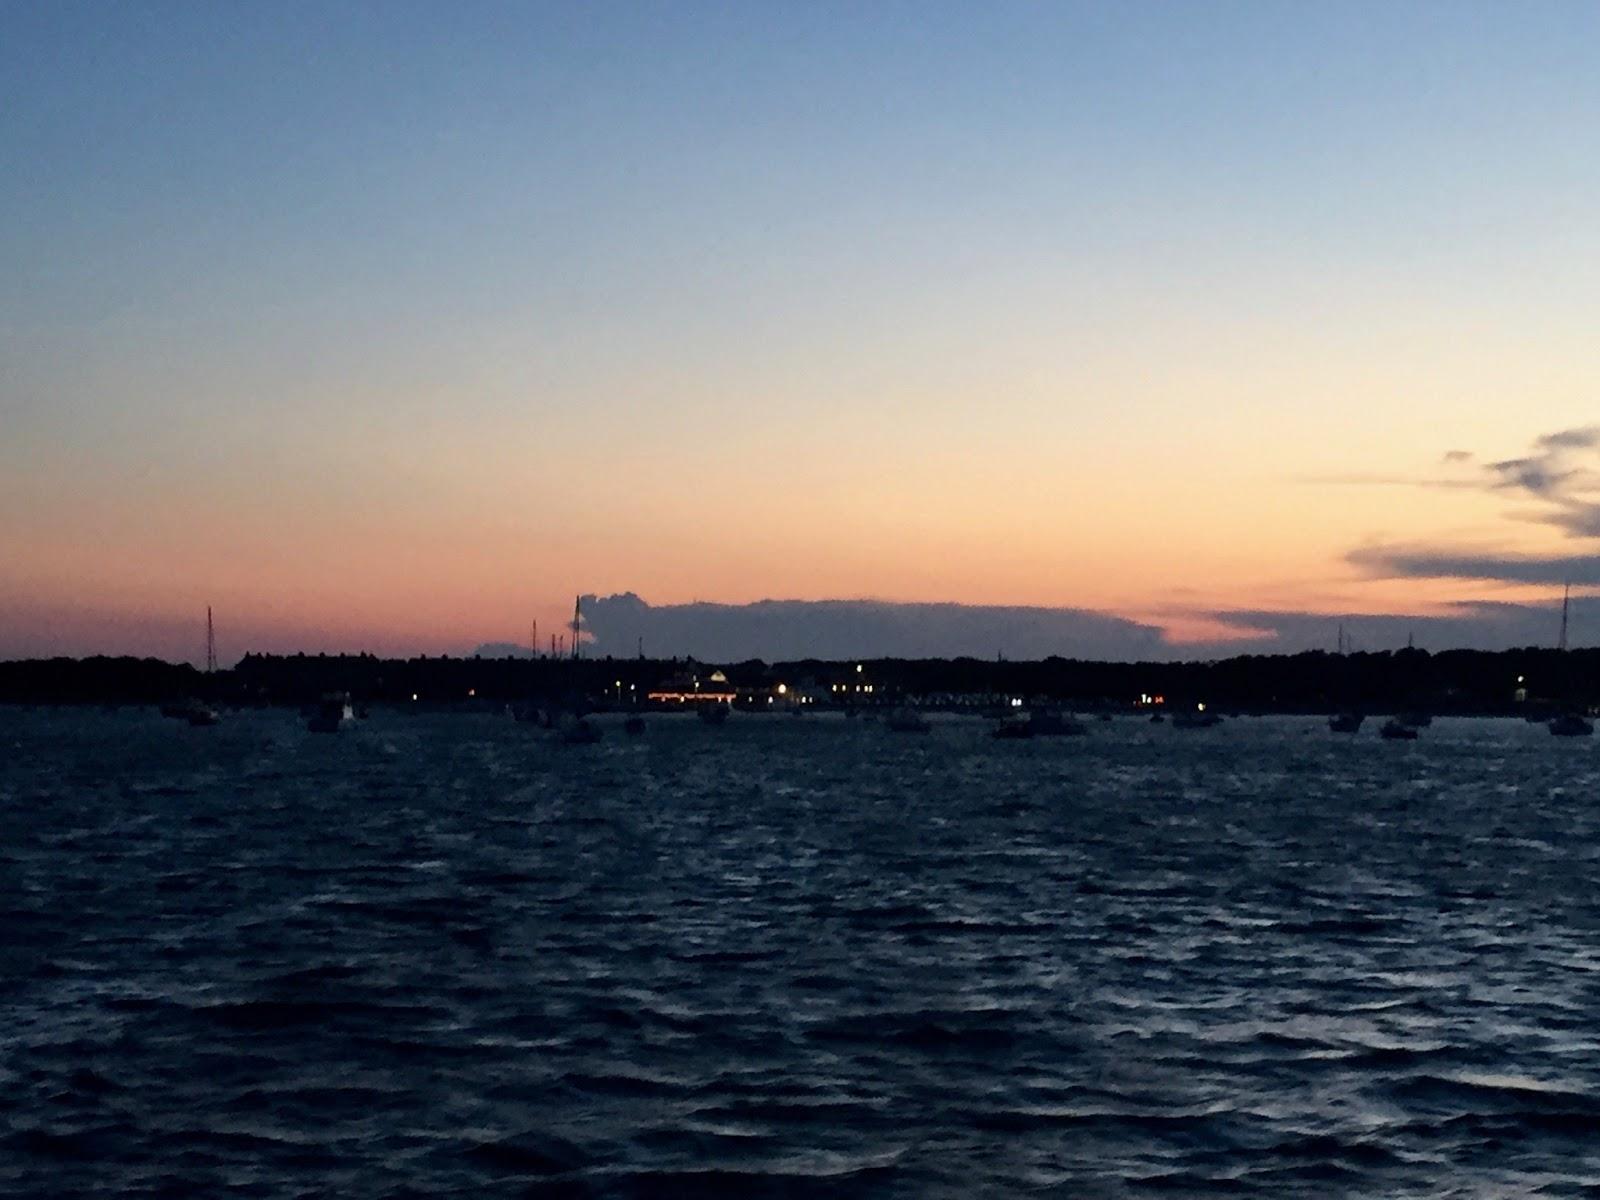 Sea at sunset, Cape Cod